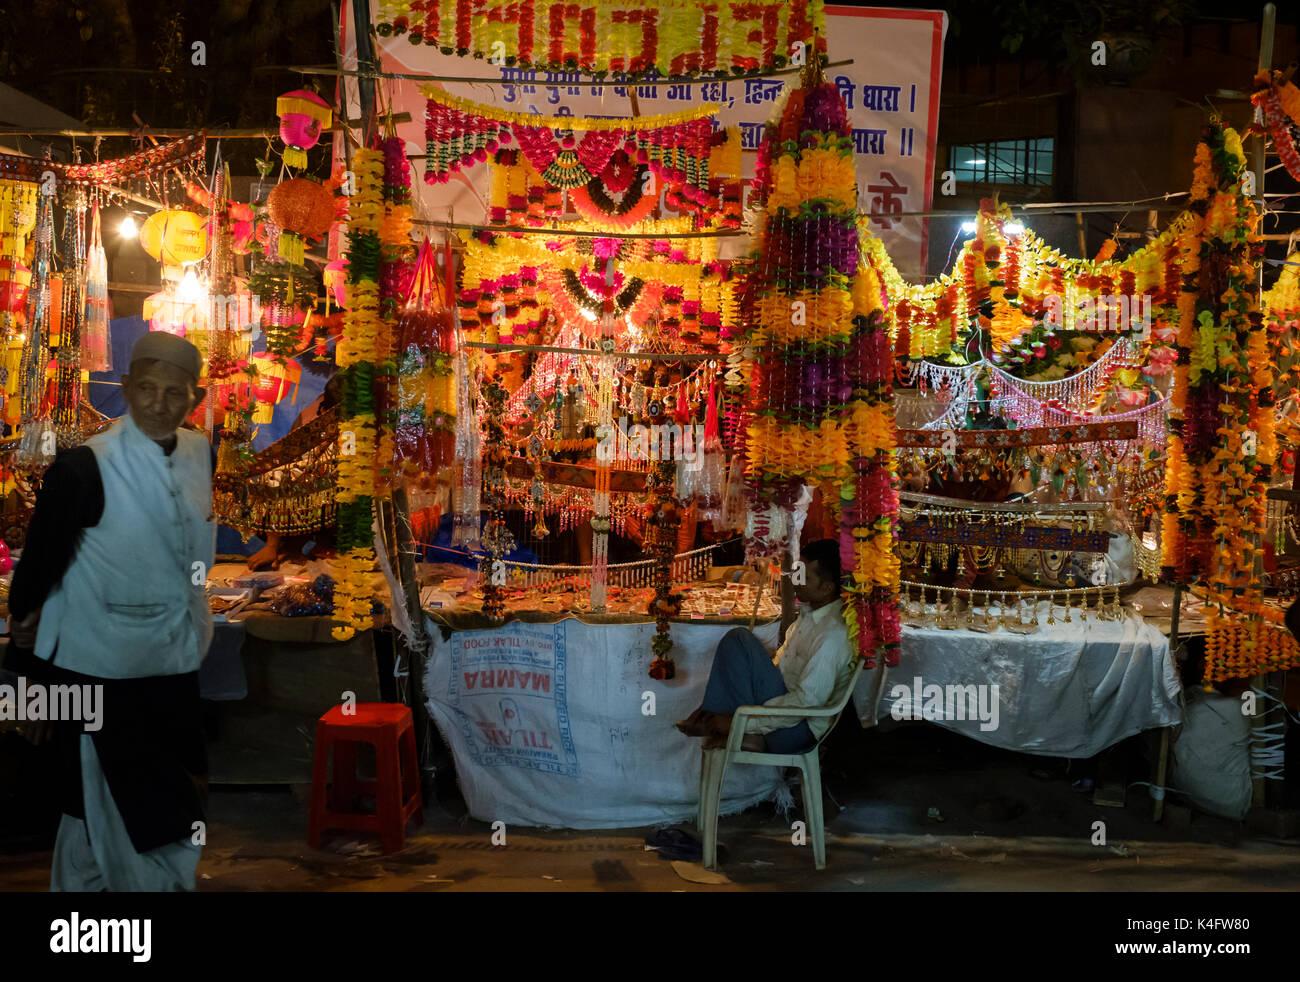 NEW DELHI, INDIA - CIRCA OCTOBER 2016: Merchant around the spice market and the Chandni Chowk area in Old Delhi at night. - Stock Image